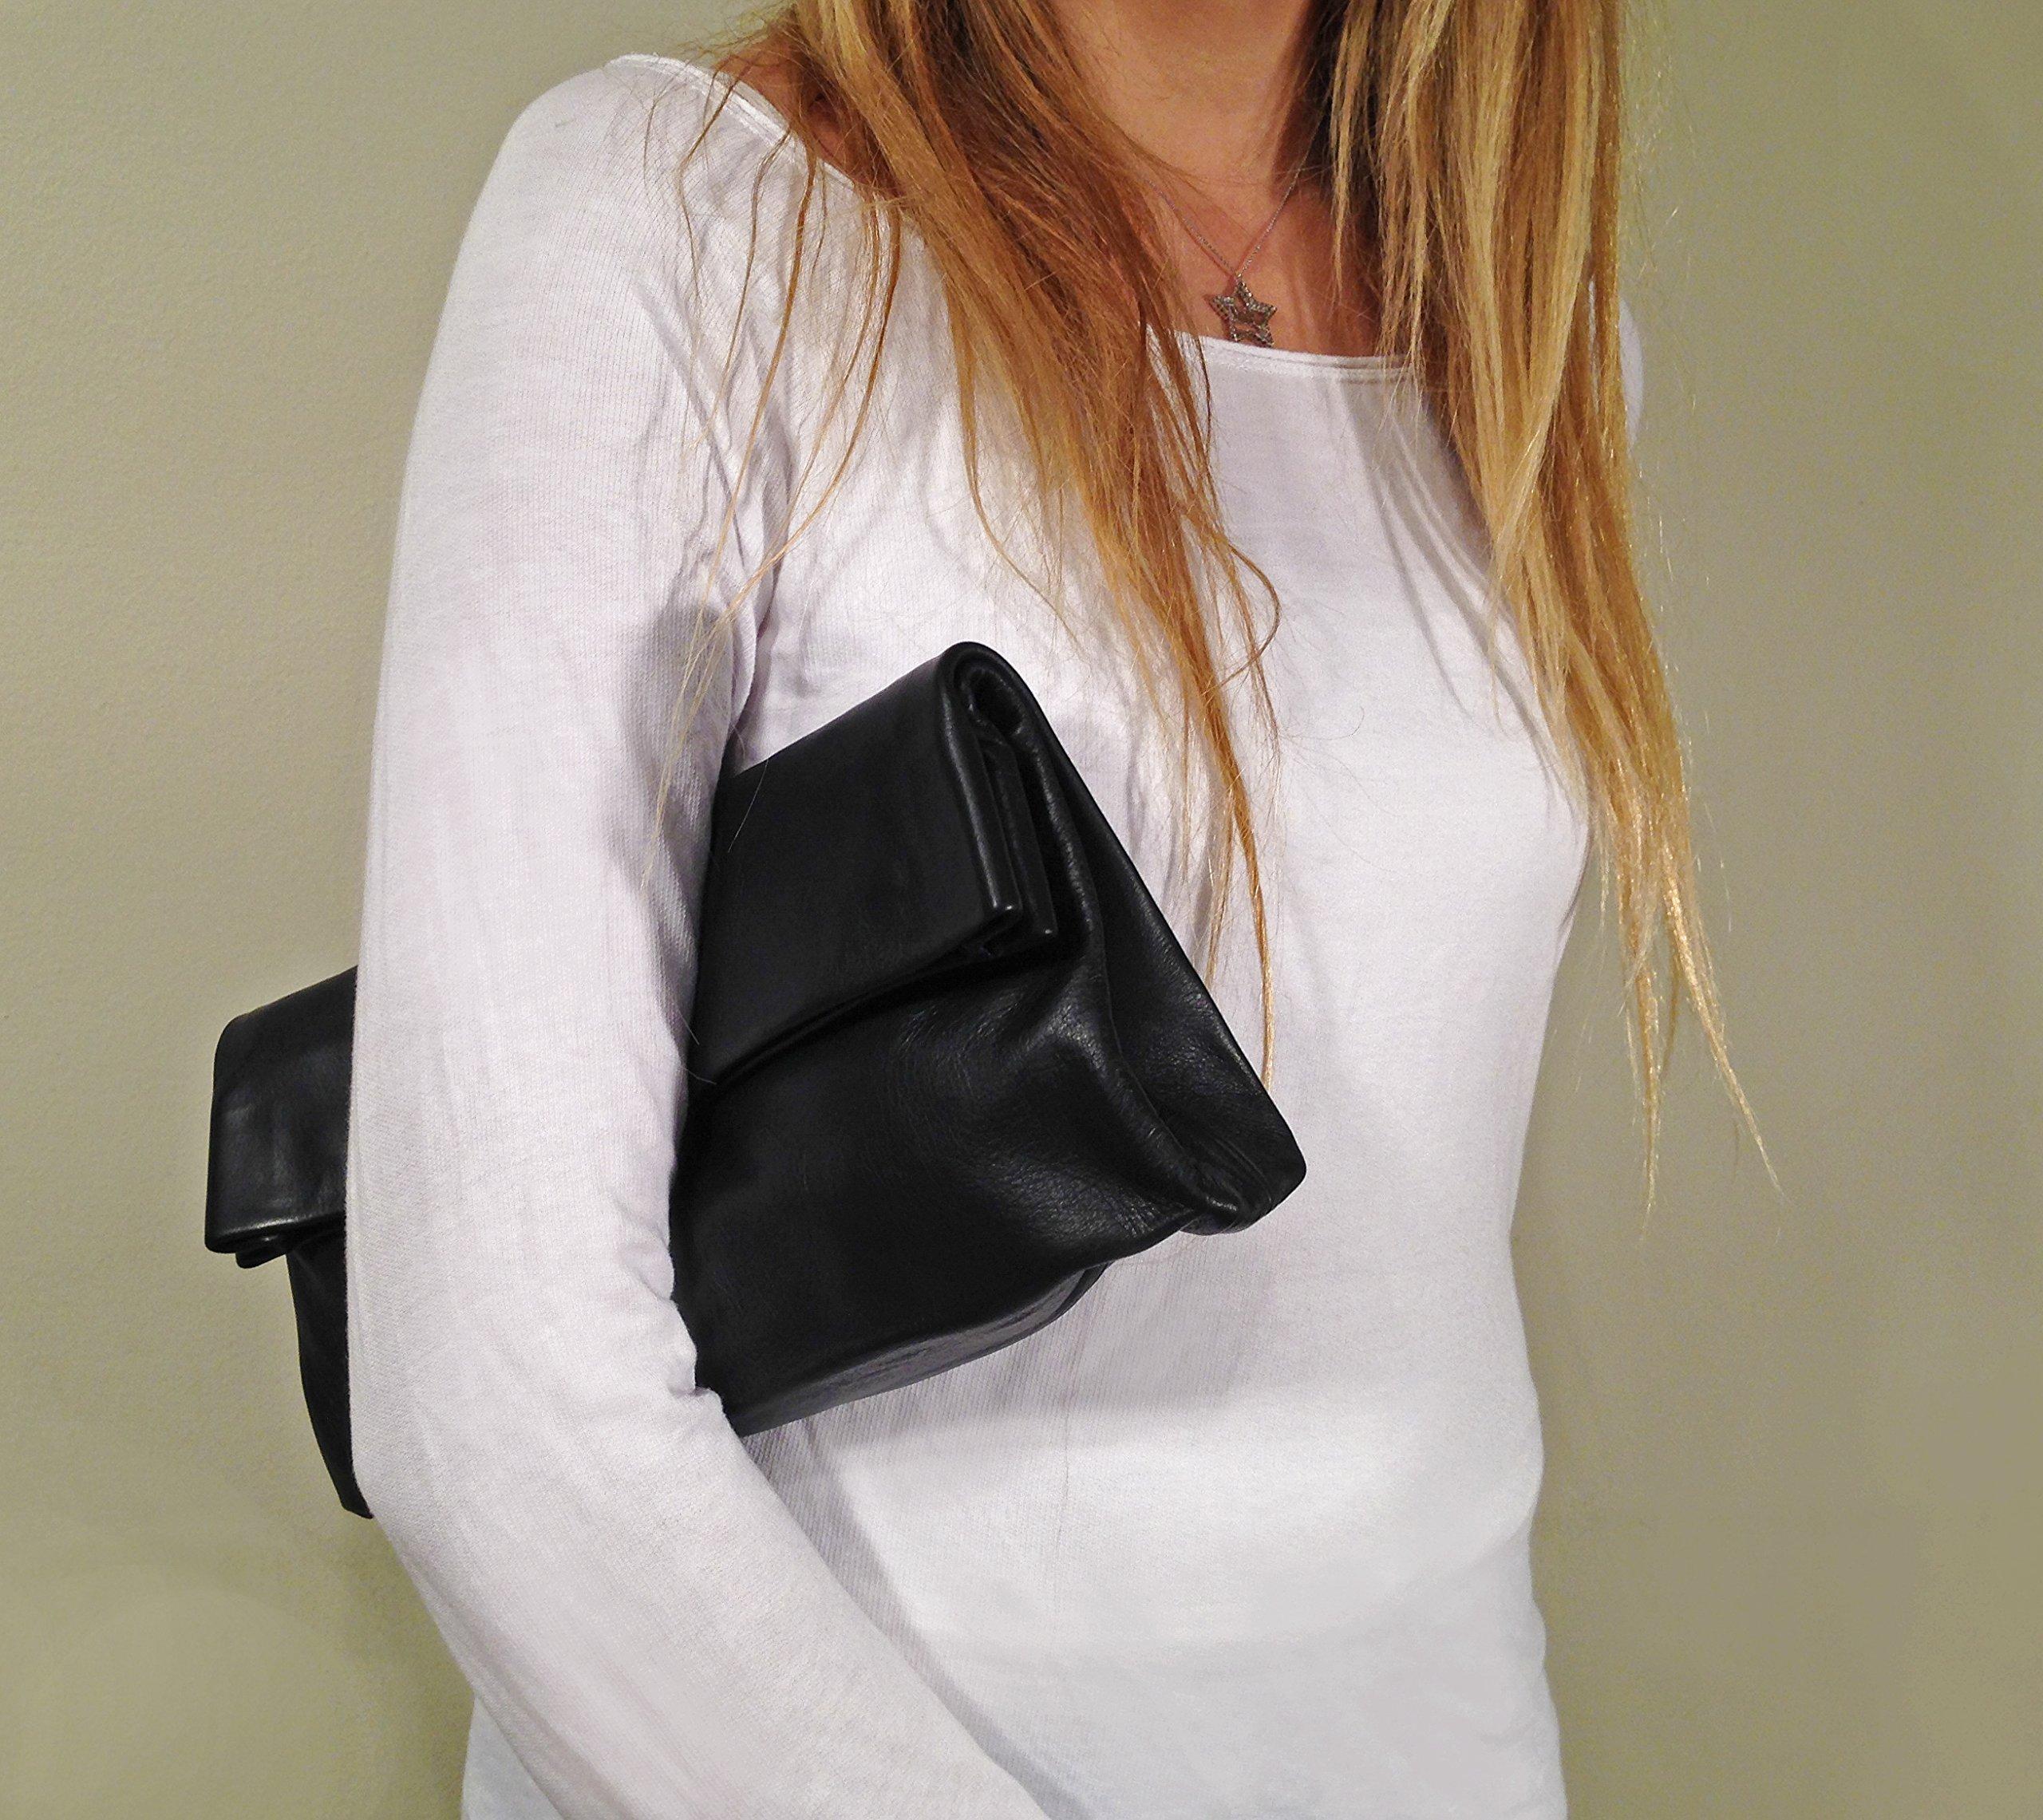 Foldover Women black clutch purse leather handbag in Handmade Crossbody strap optins